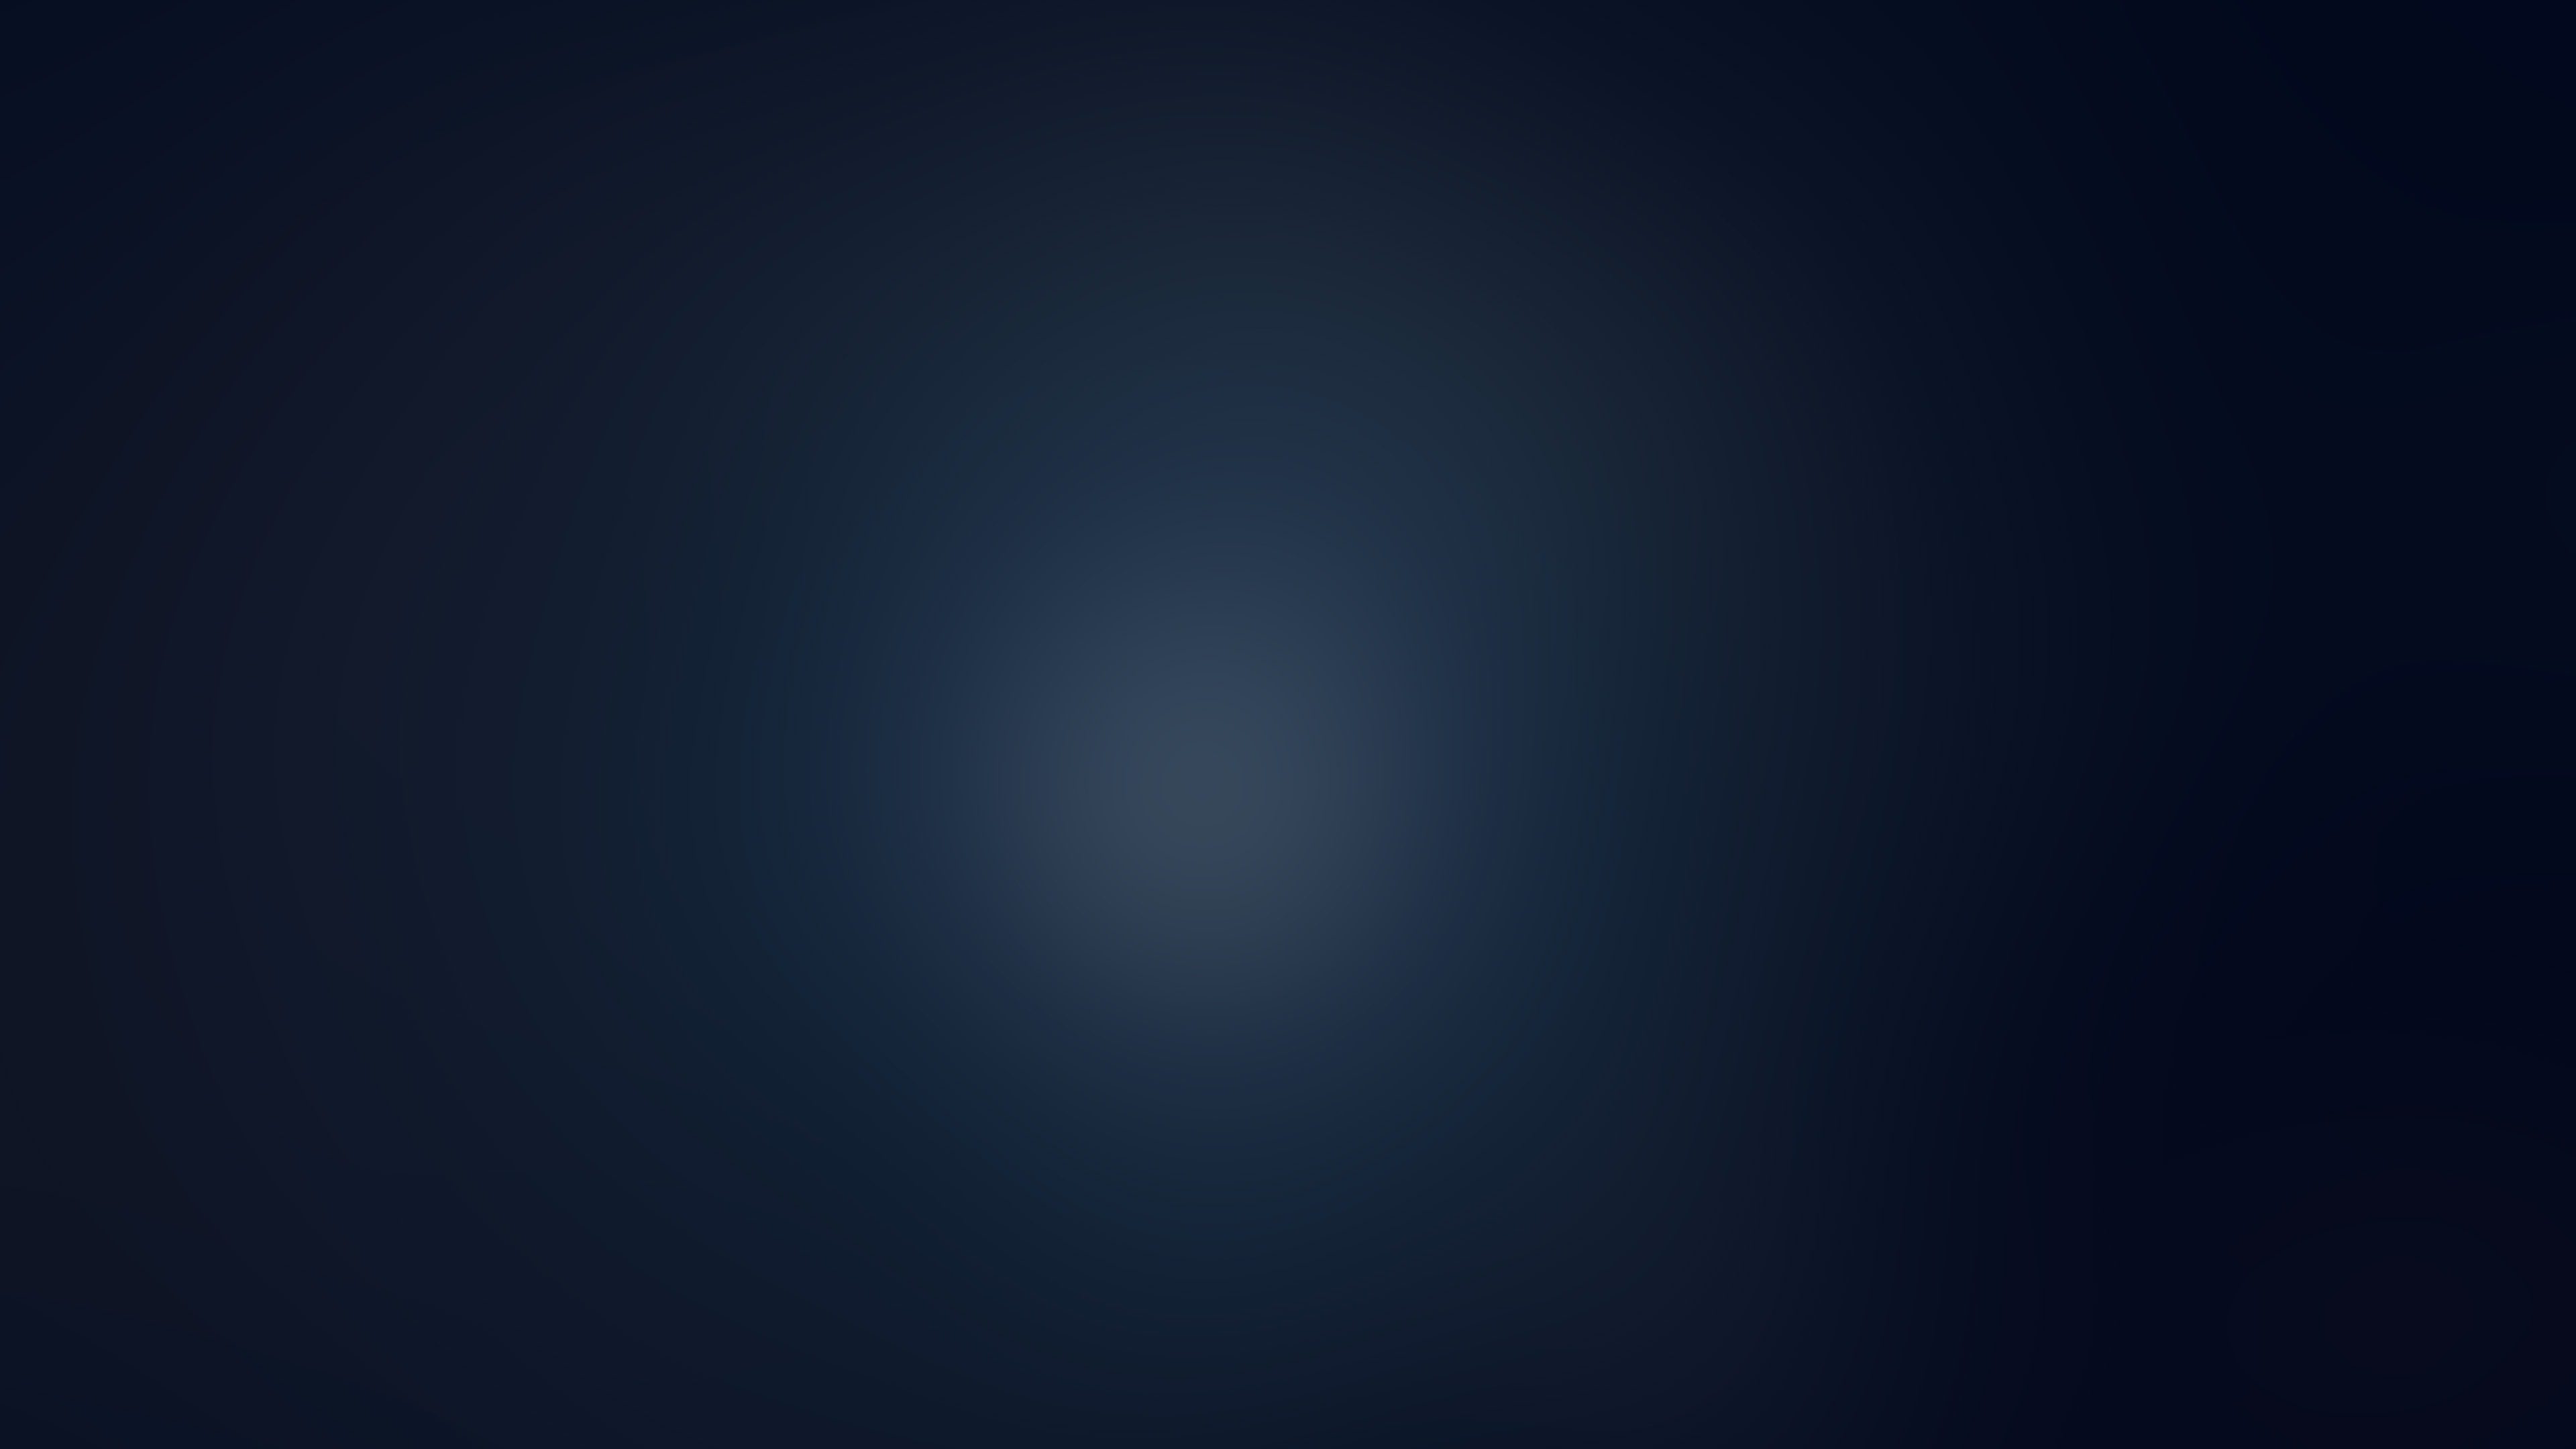 Android Lollipop Wallpaper Hd 1080p 3840 X 2400